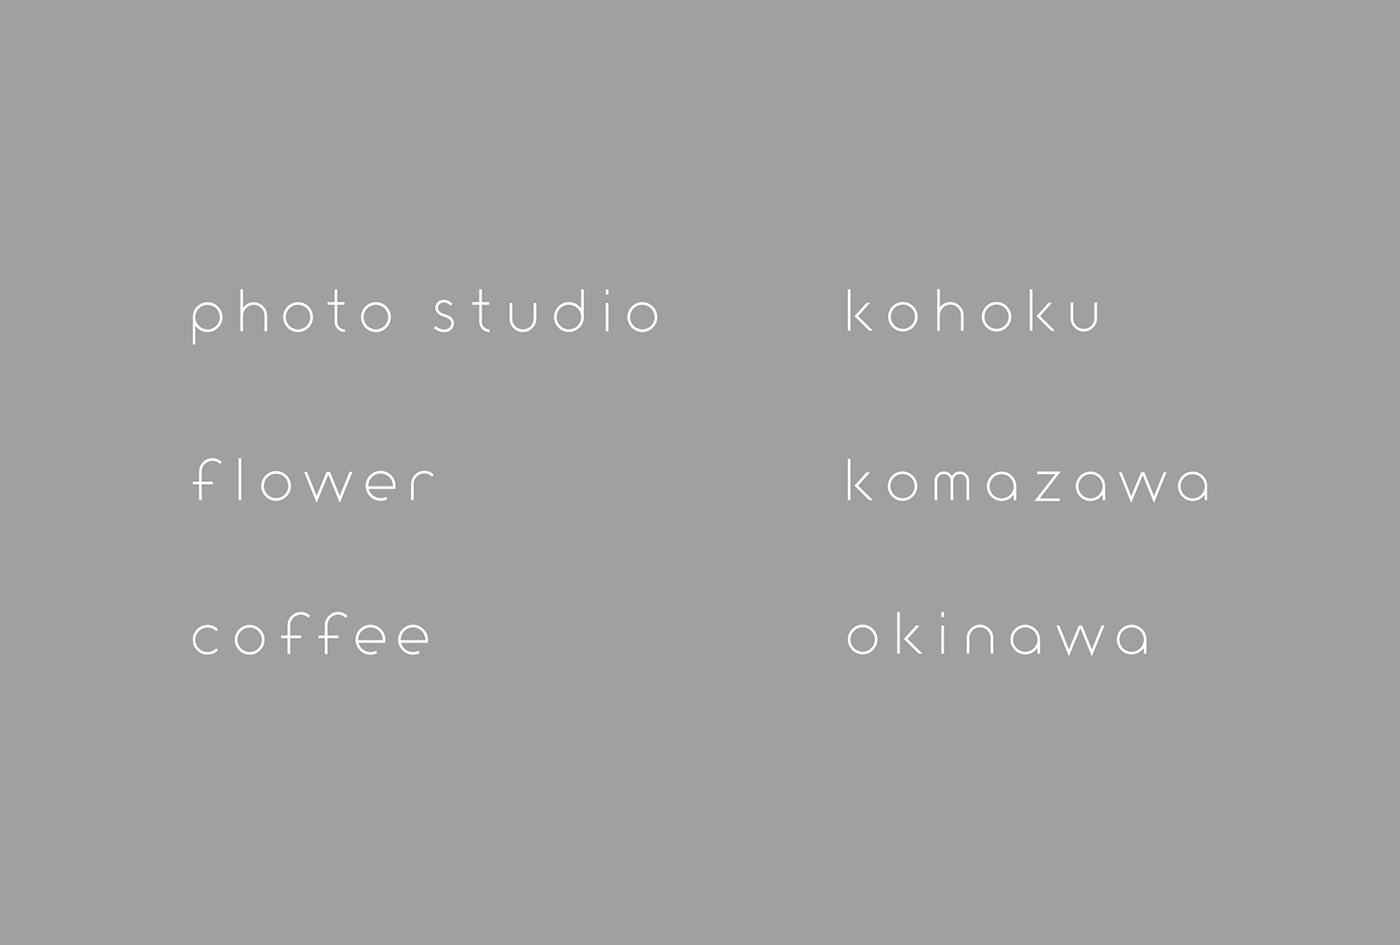 CI Coffee gray mintgreen Packaging photostudio sign White コーヒー フォトスタジオ